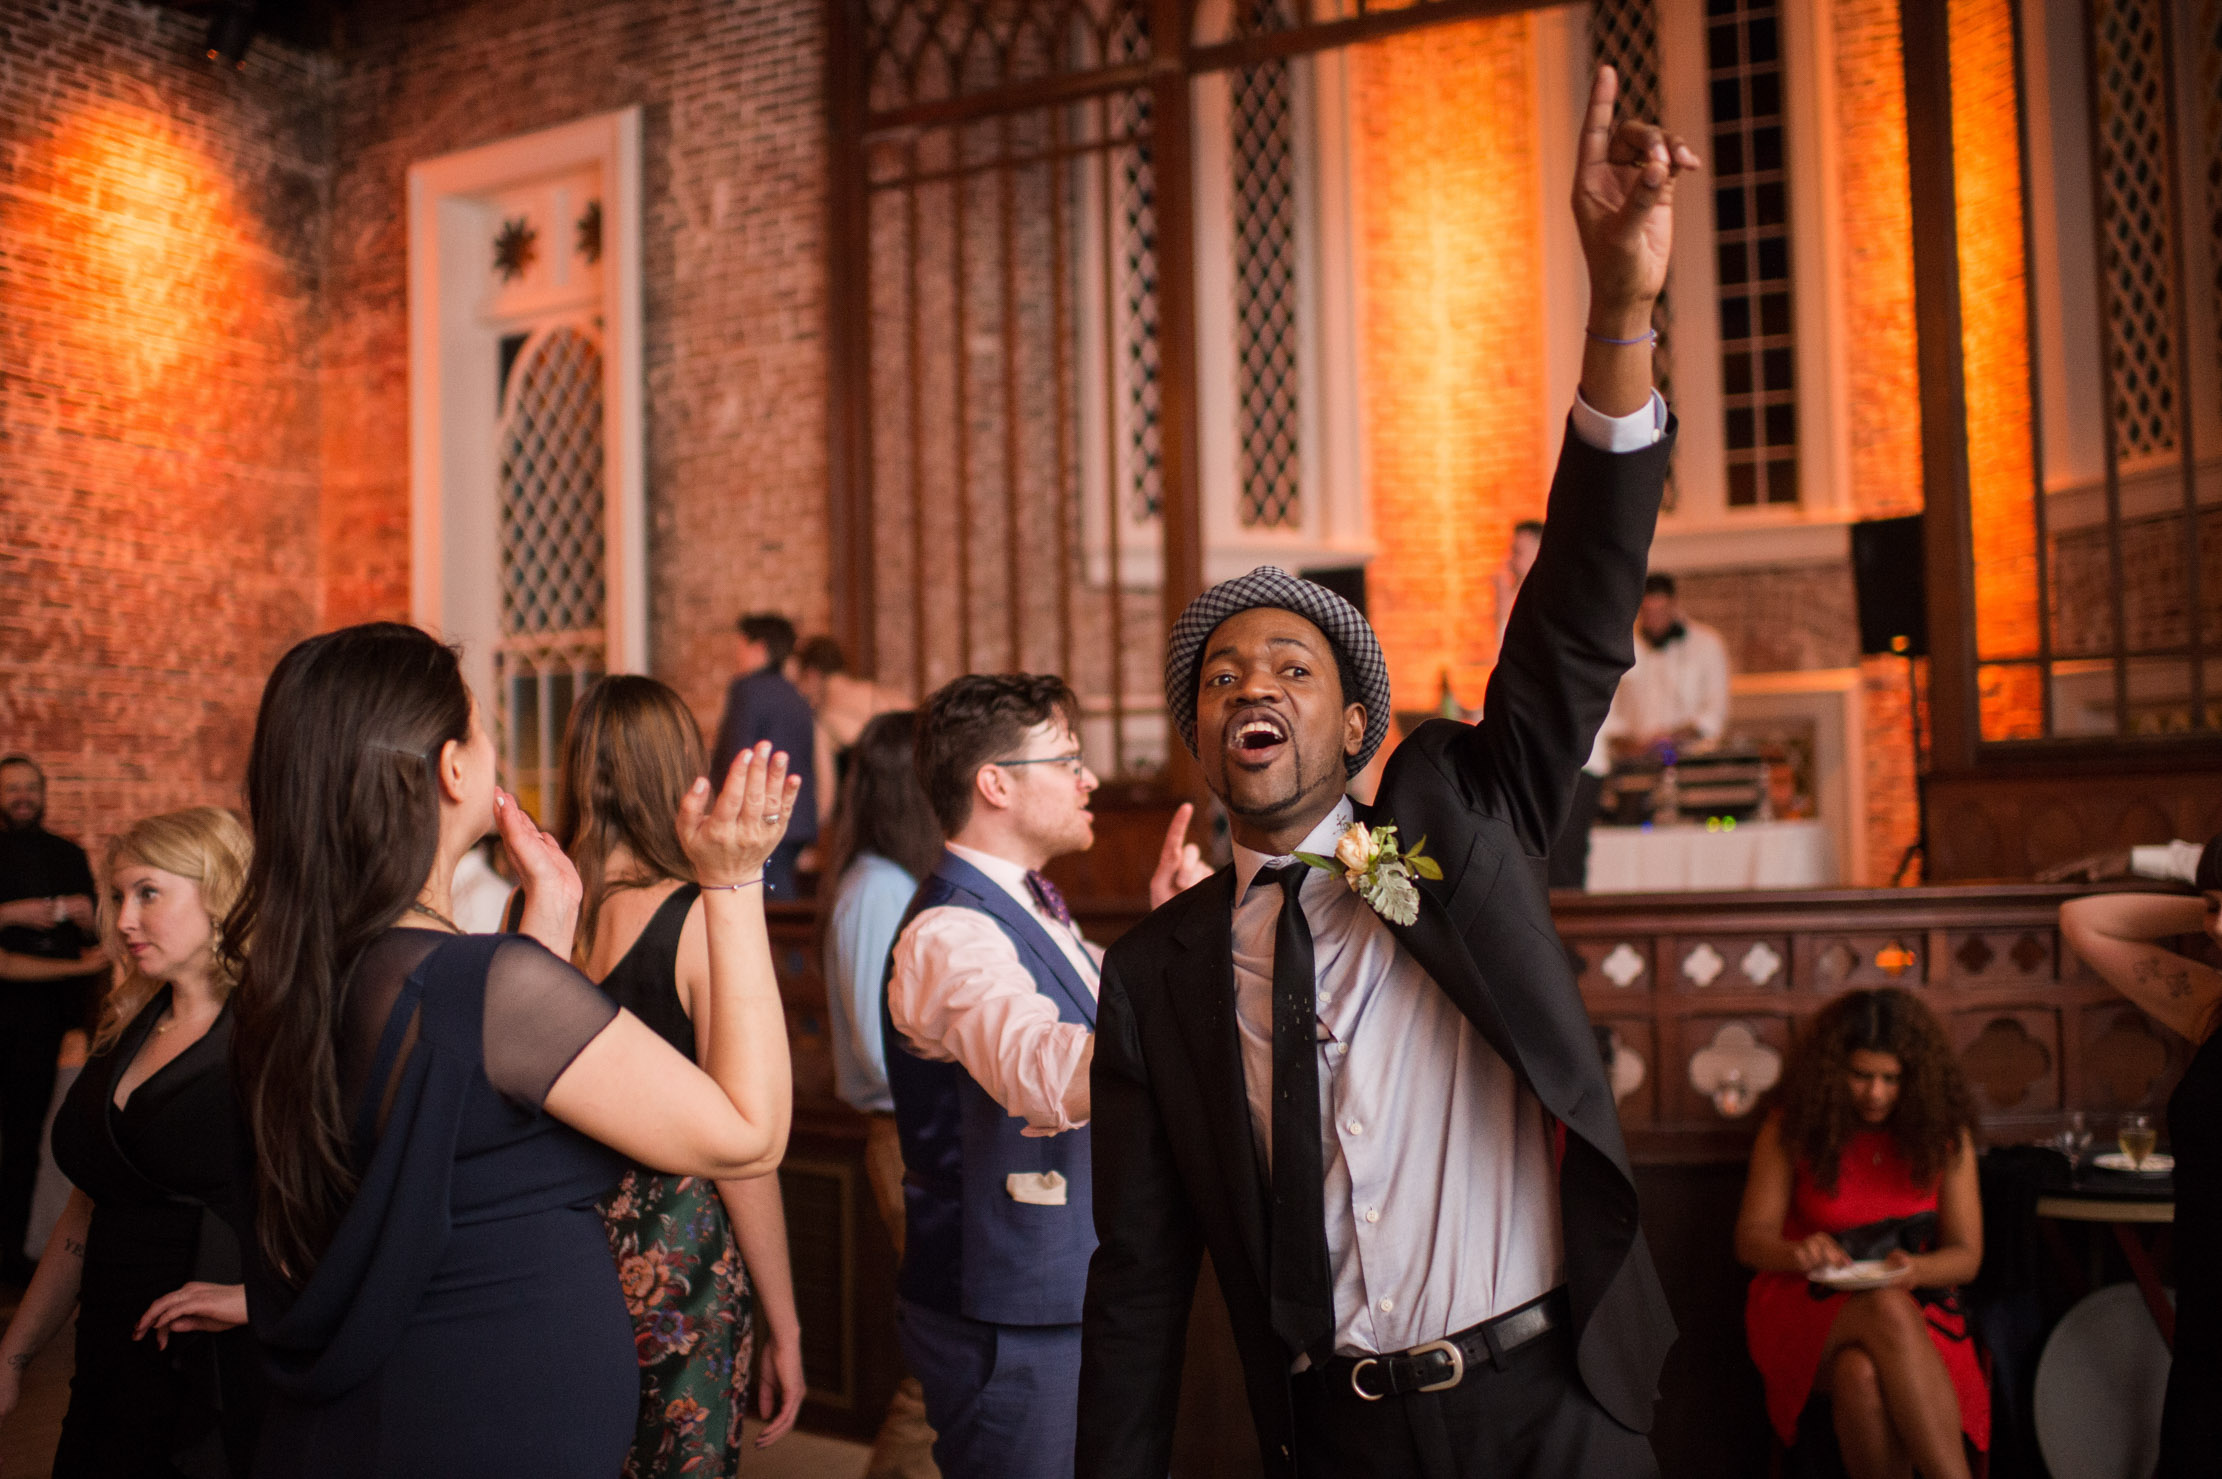 NOLA-Felicity-Church-Ace-Hotel-Wedding-1138.jpg